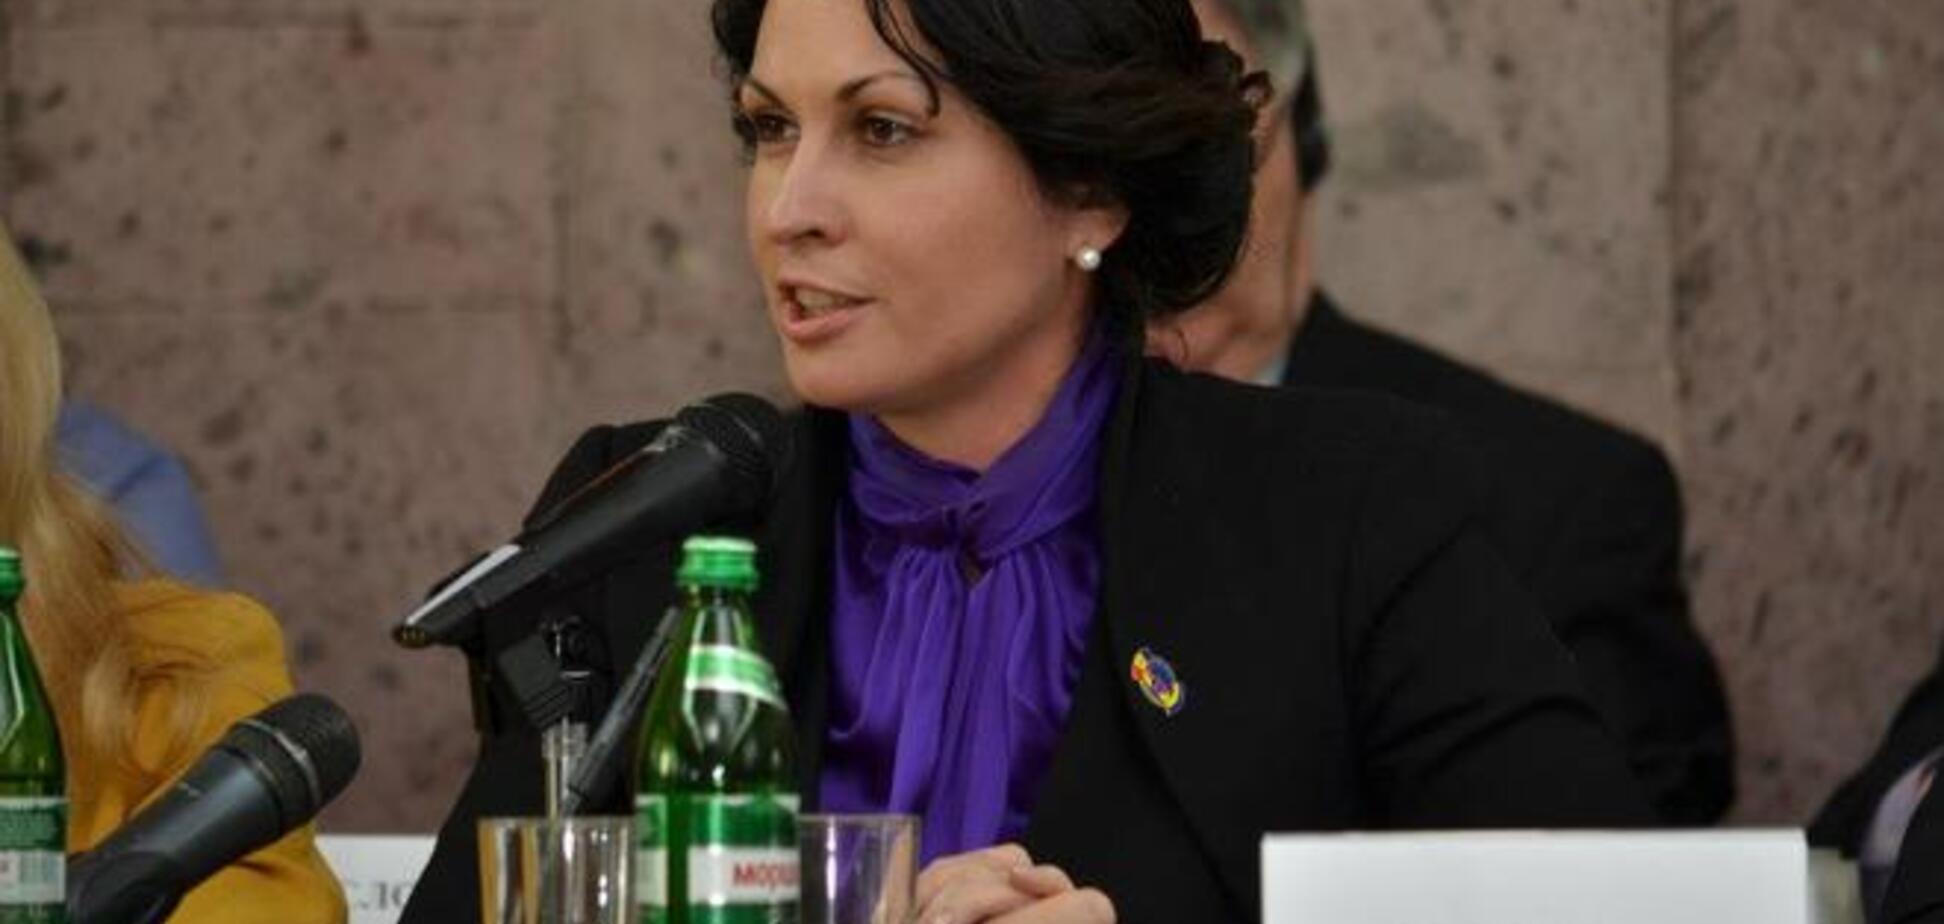 СБУ открыла против Калетник уголовное производство за сепаратизм